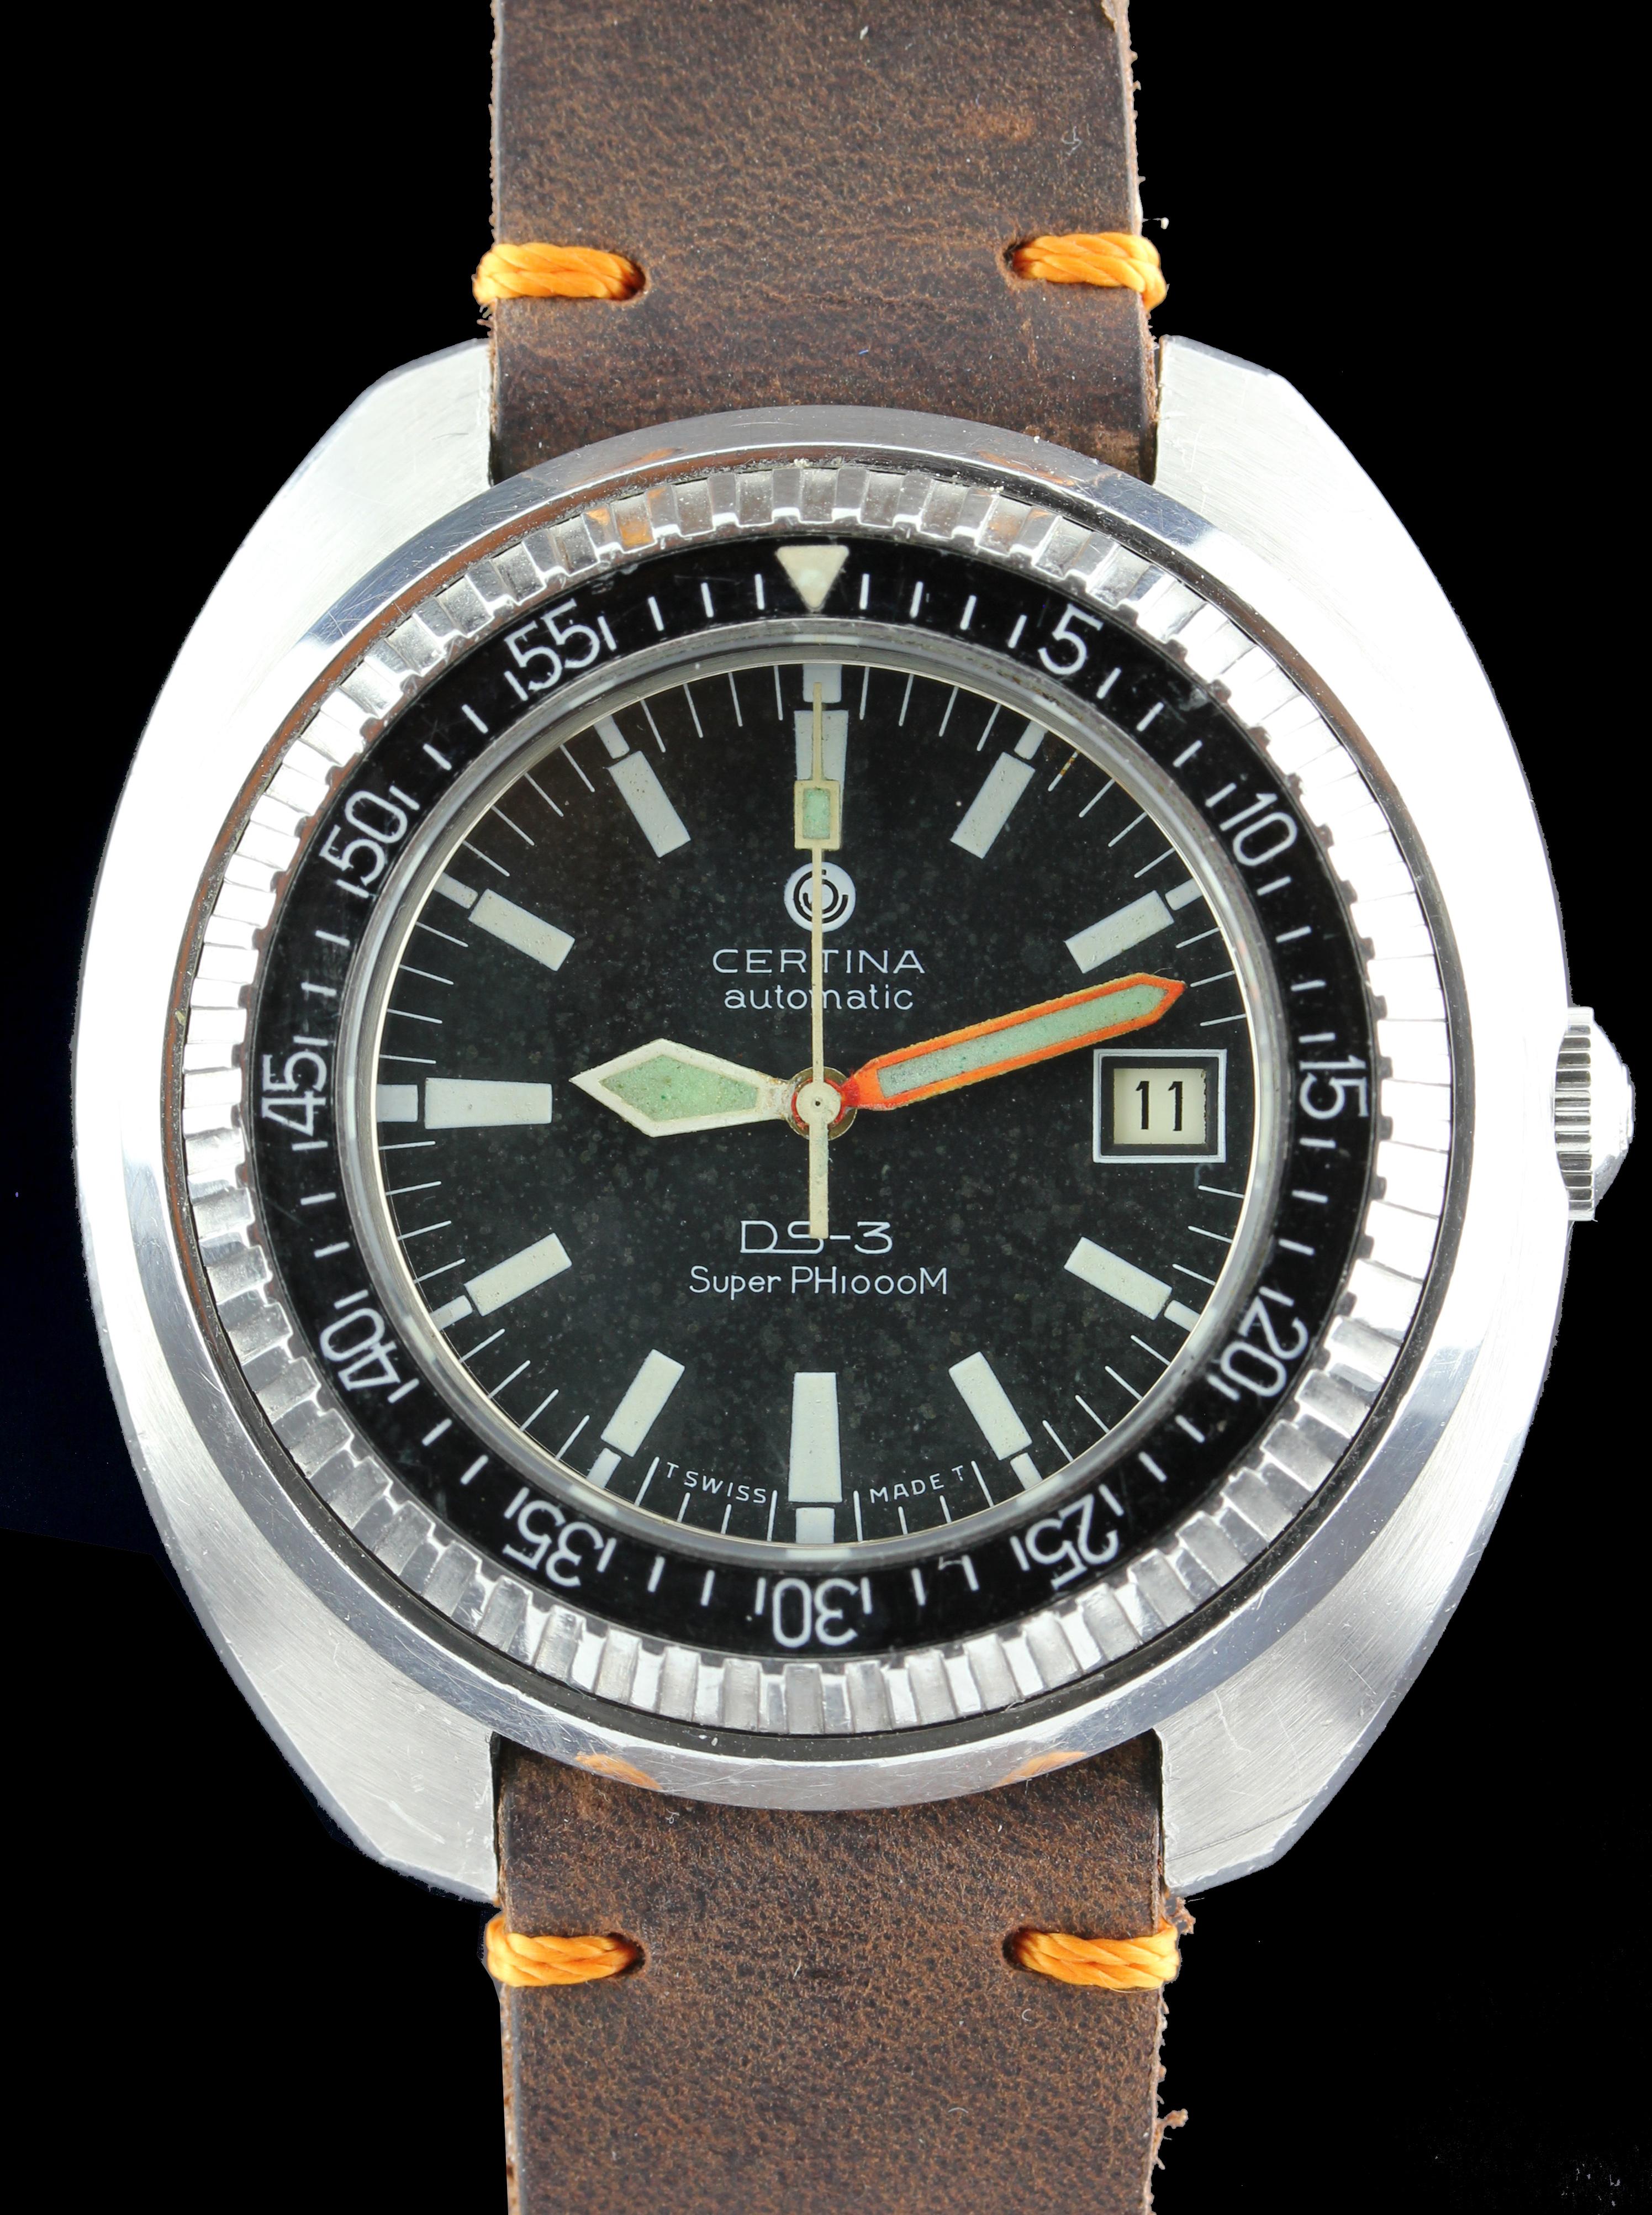 CERTINA Diving watch DS.3 Super PH 1000m